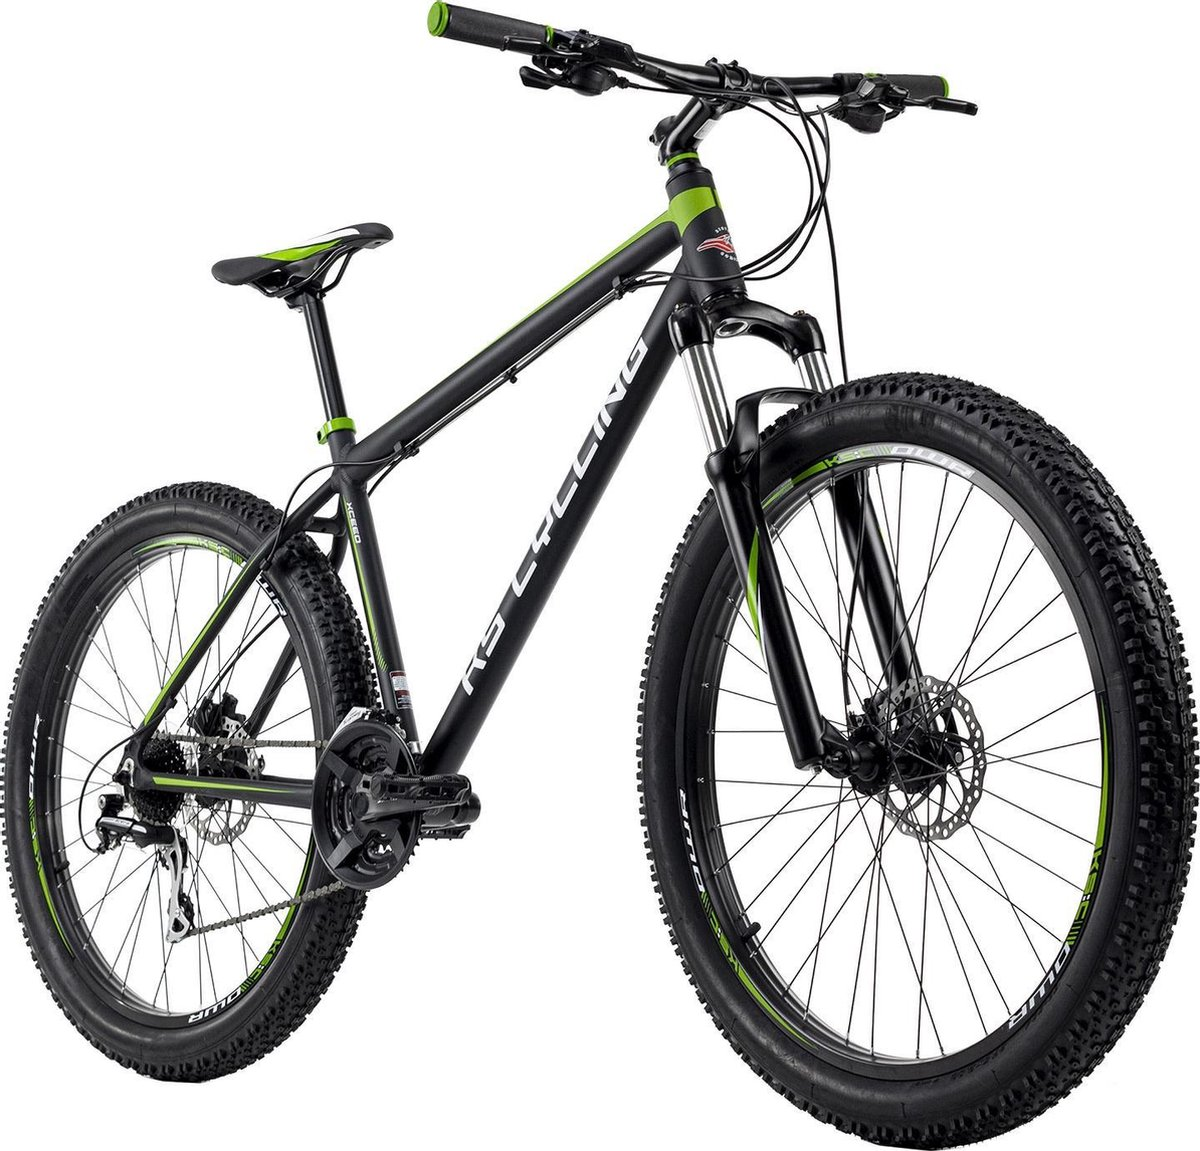 "Ks Cycling Fiets Mountainbike Hardtail 27,5"" Xceed -"